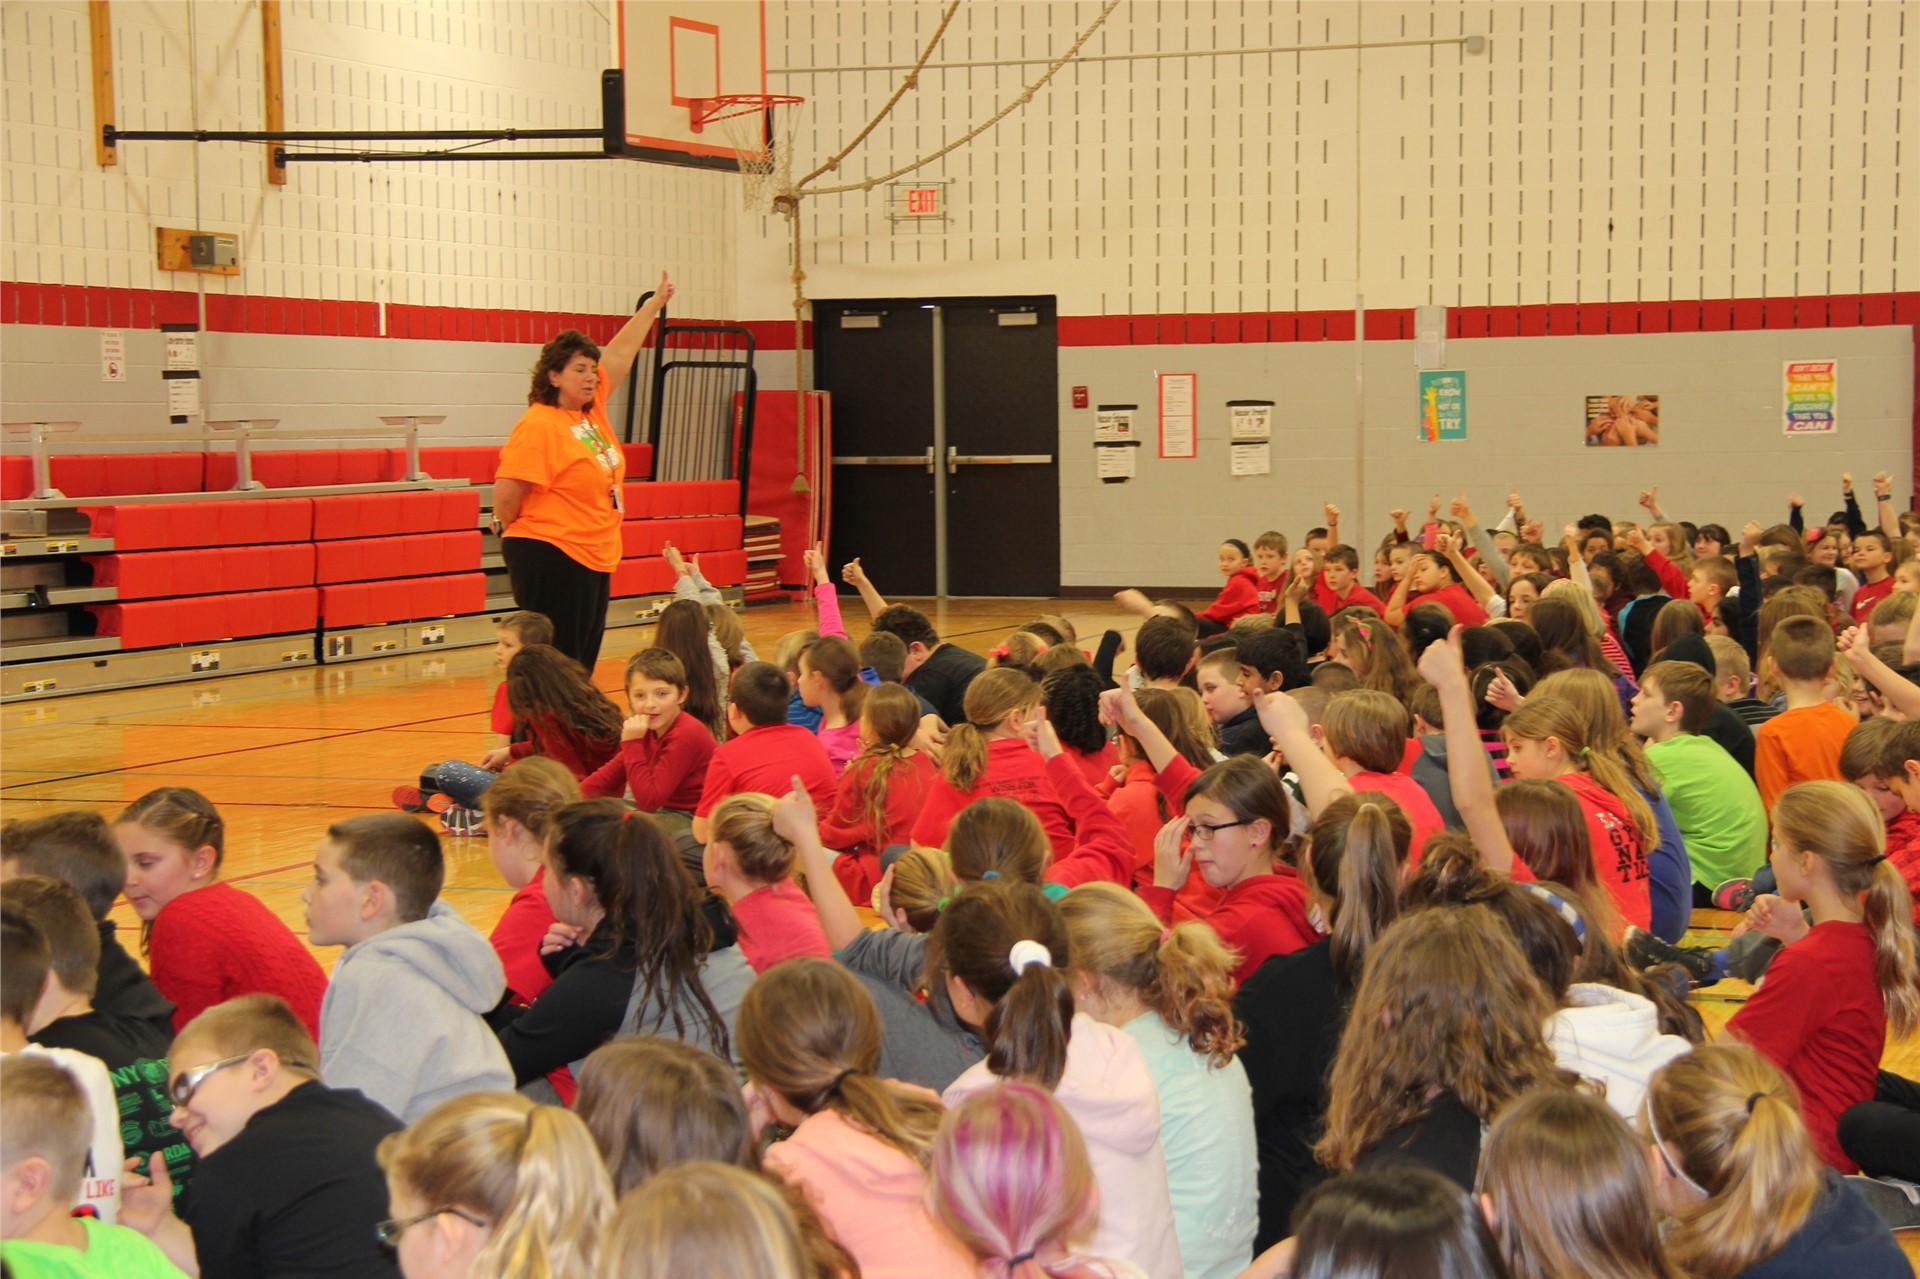 principal hammond talking to students